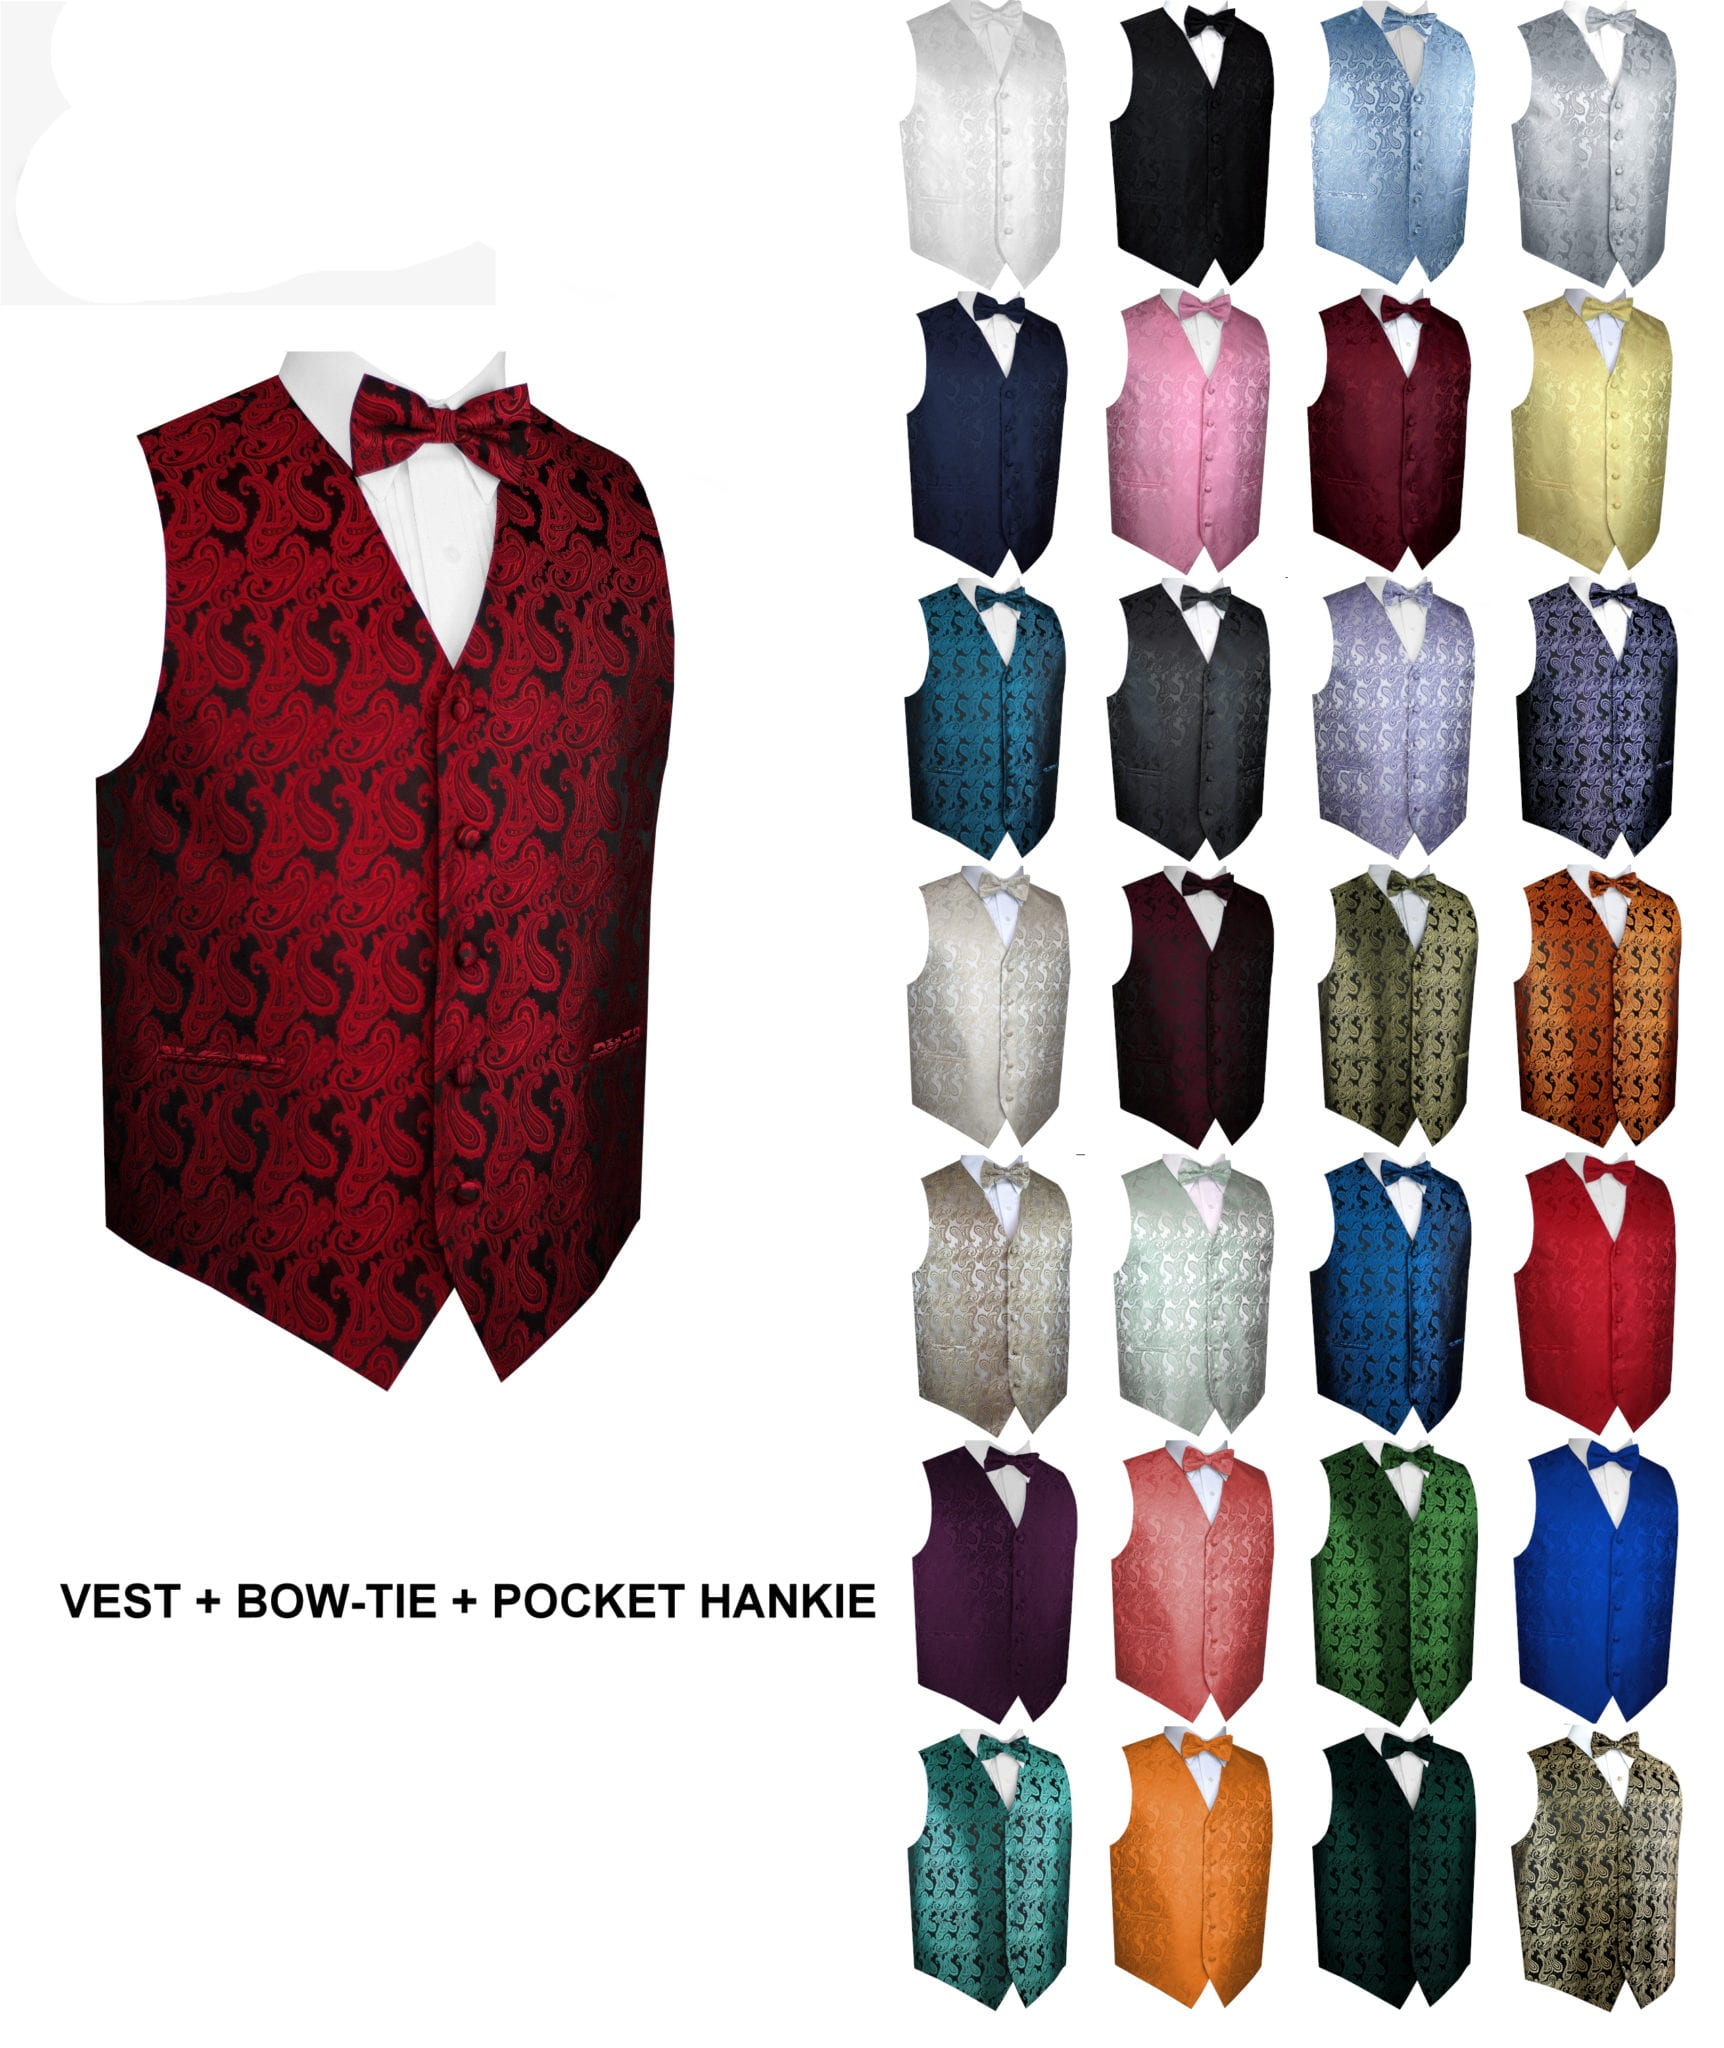 Mens Formal Tuxedo Vest /& Bow-Tie Set in Orange Paisley